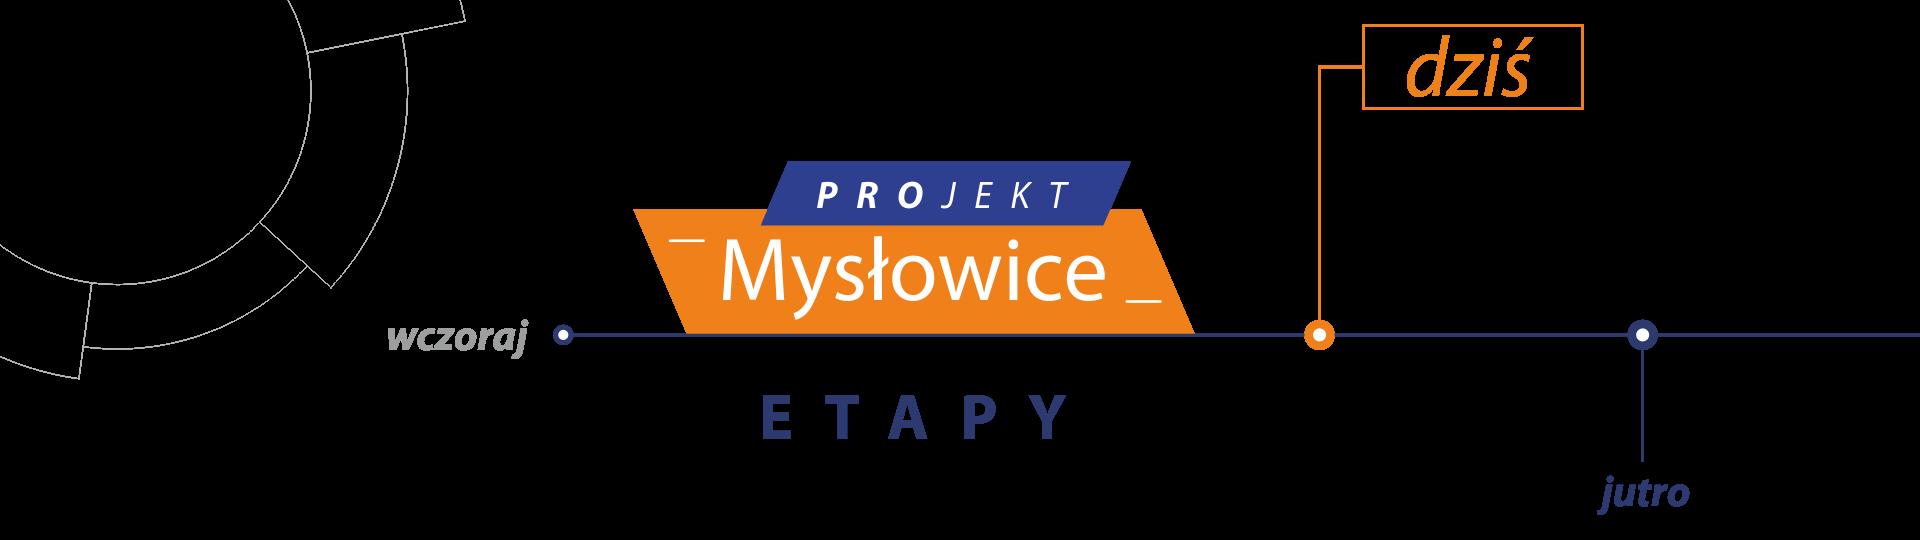 header-projekt-myslowice